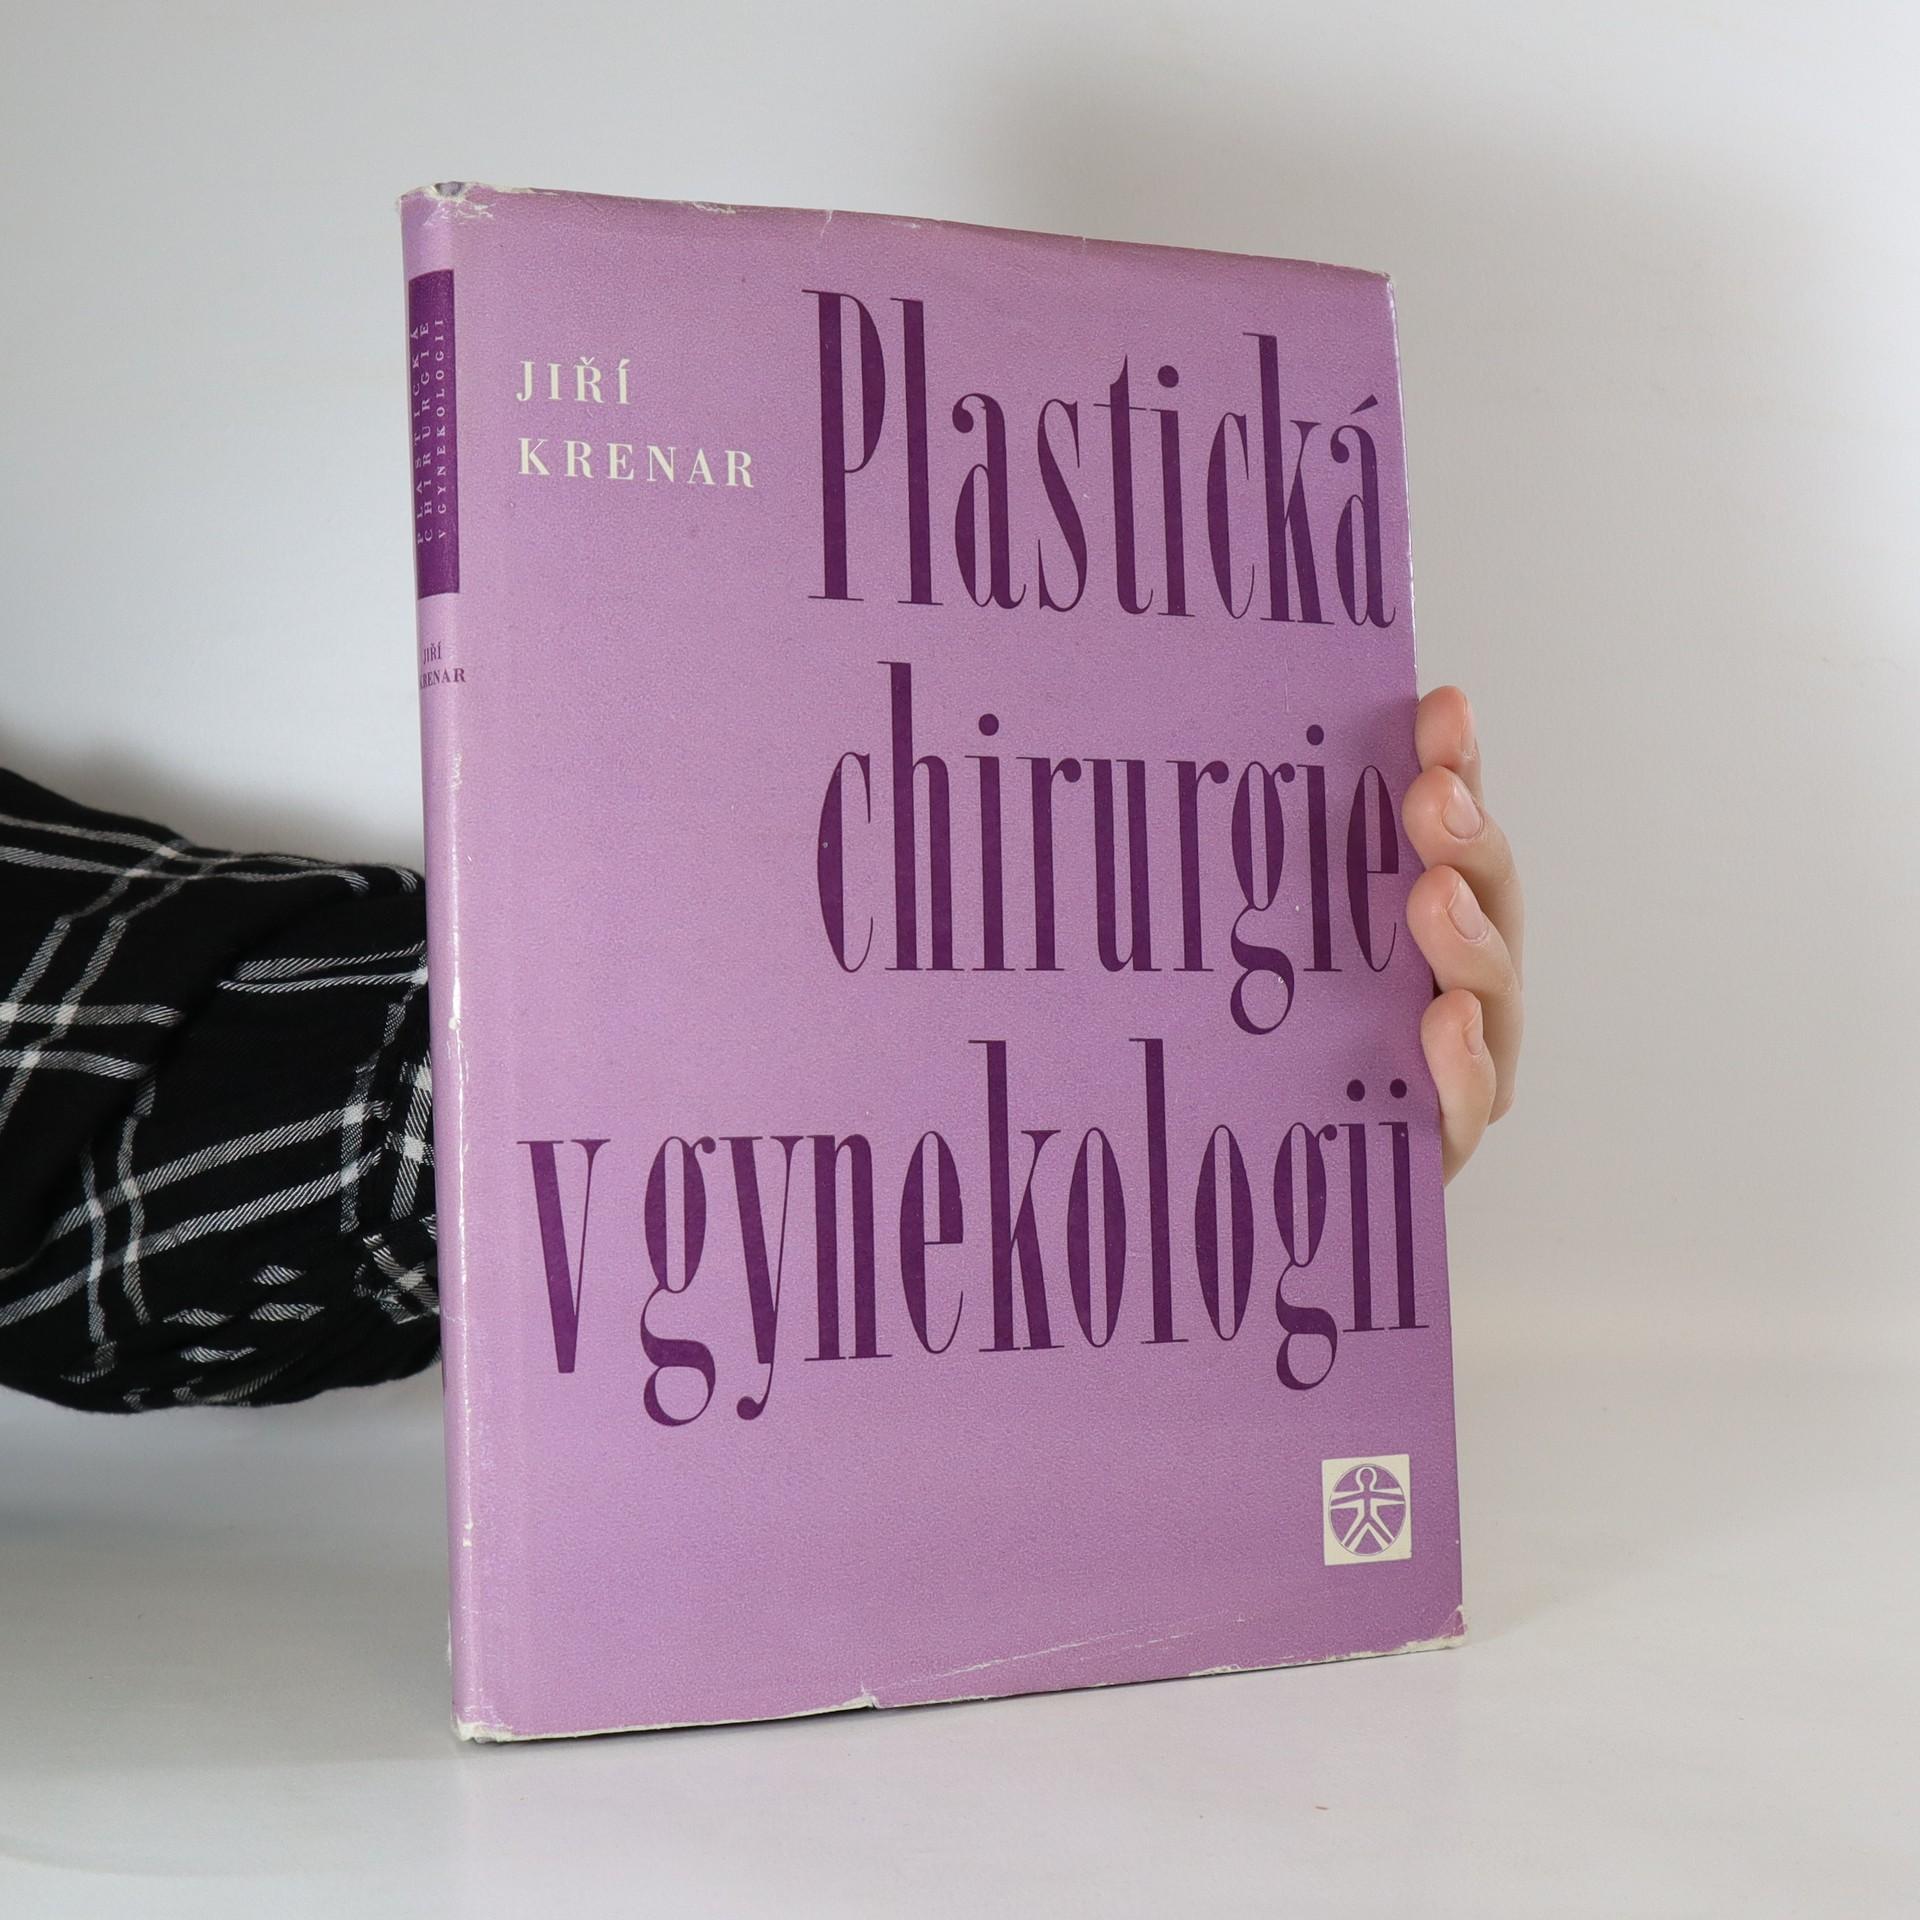 antikvární kniha Plastická chirurgie v gynekologii, 1968